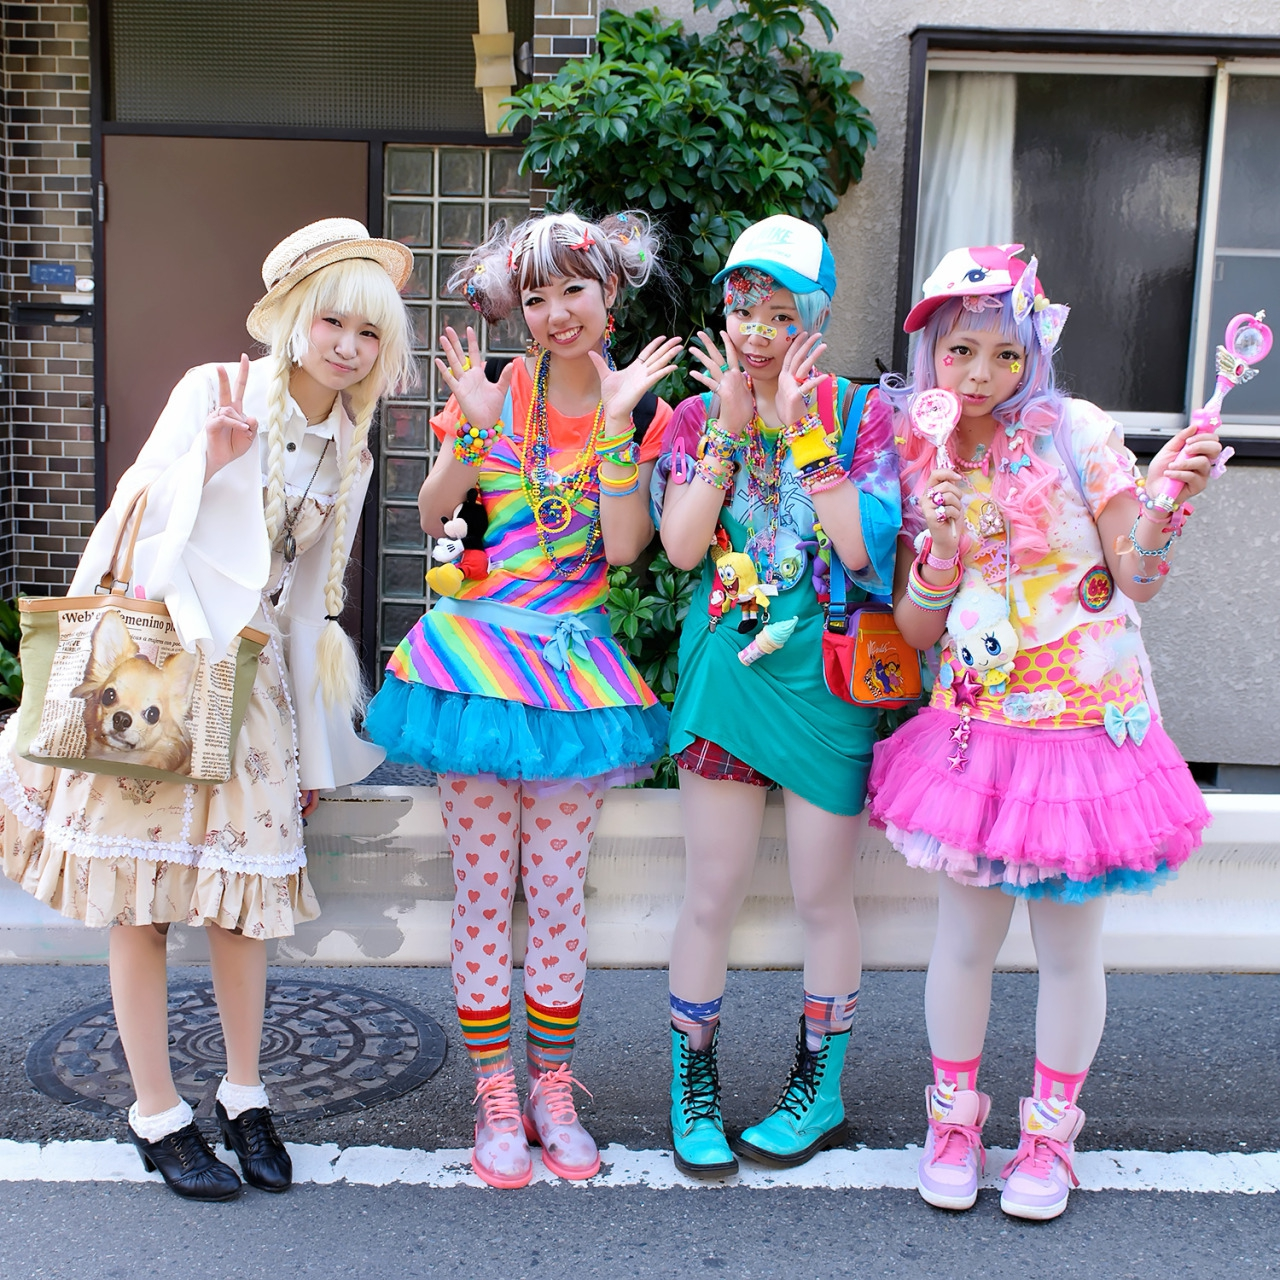 Kawaii fashion: Is it weird or cute?  Pop Japan